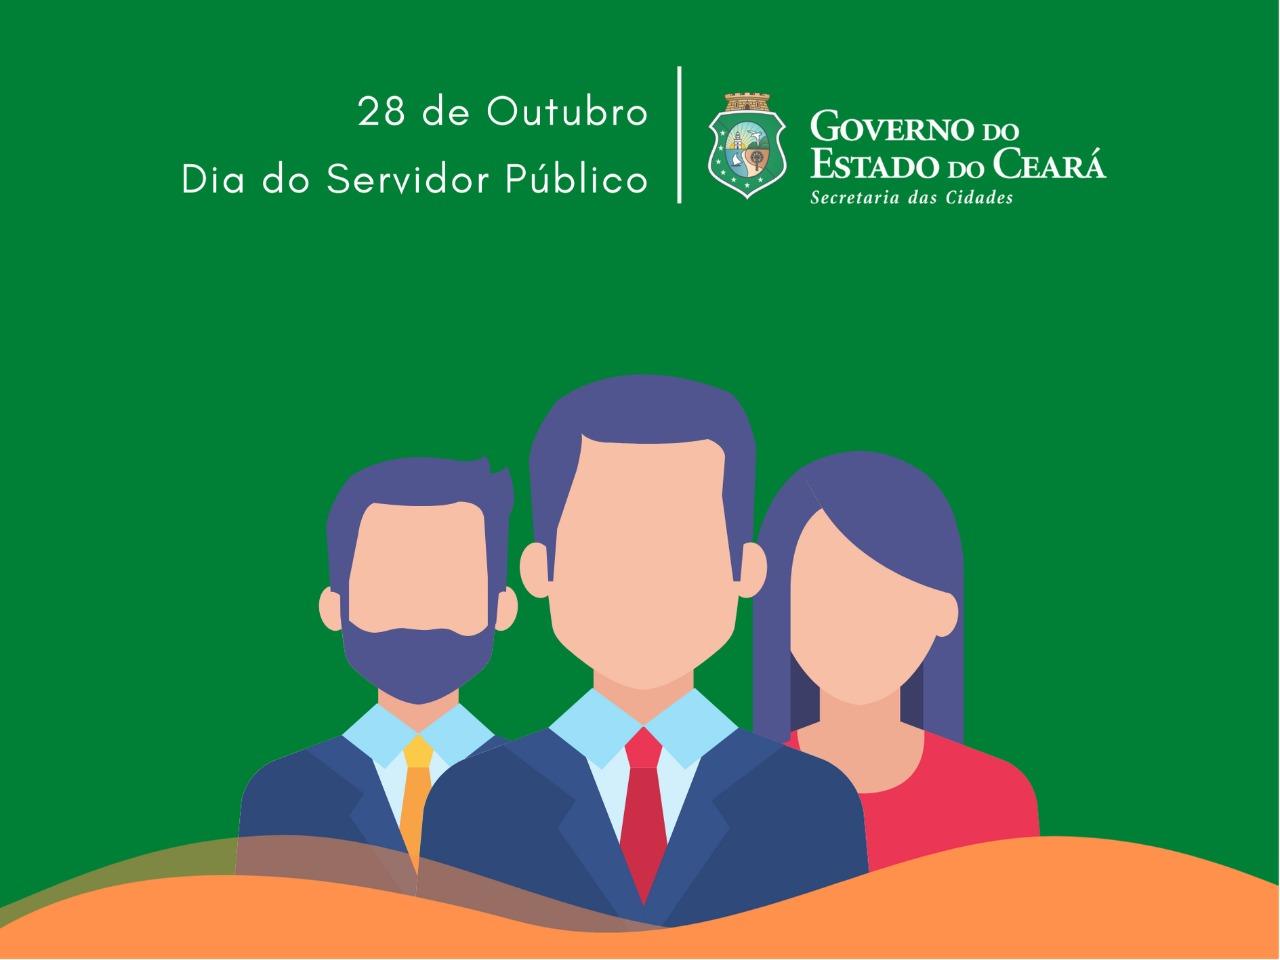 Dia 28 de outubro, Dia do Servidor Público